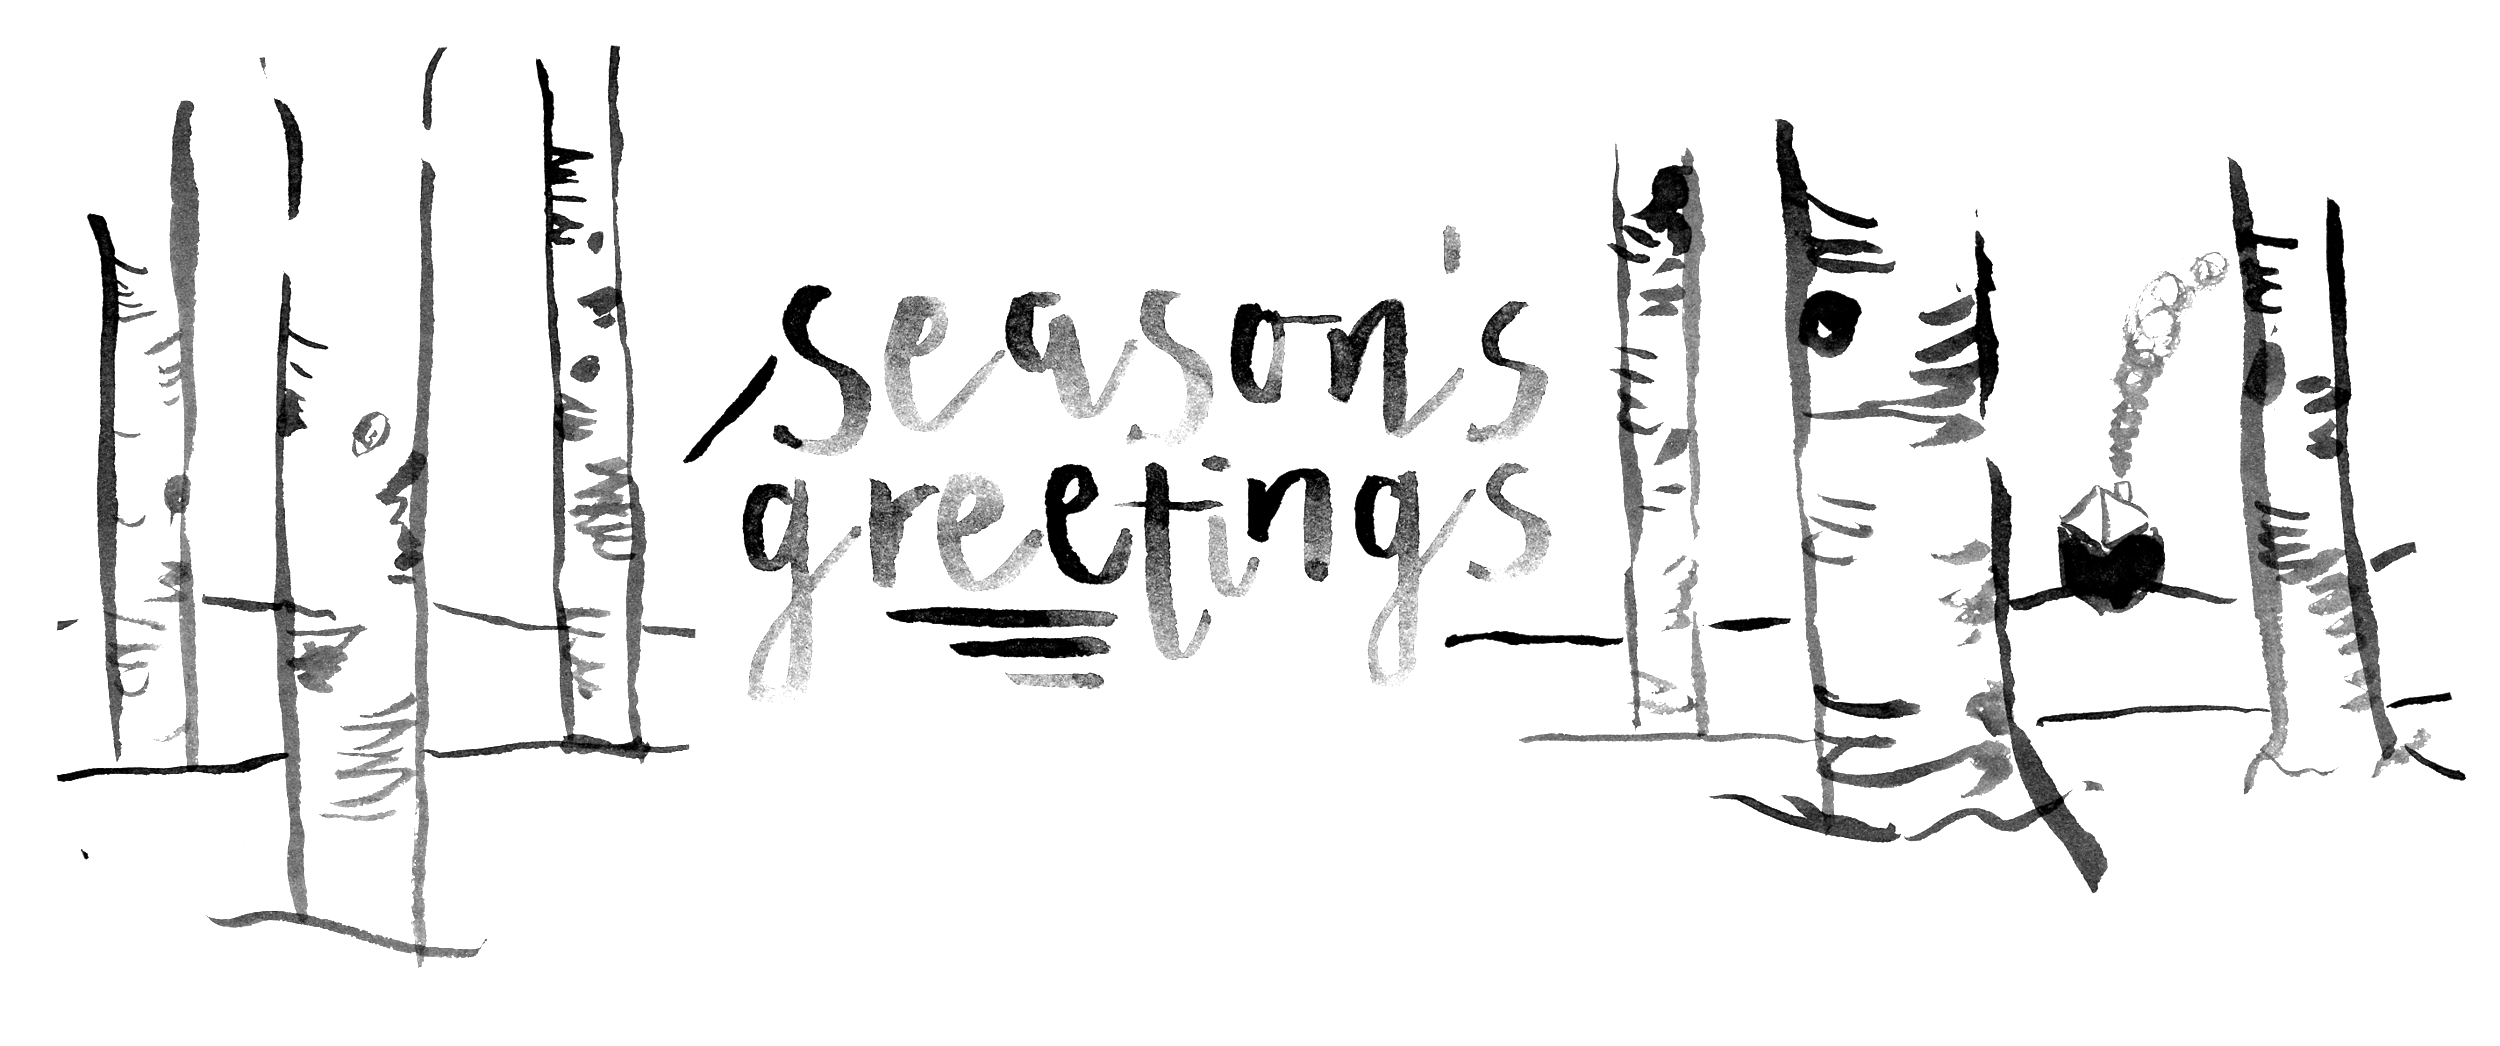 season's greetings.png